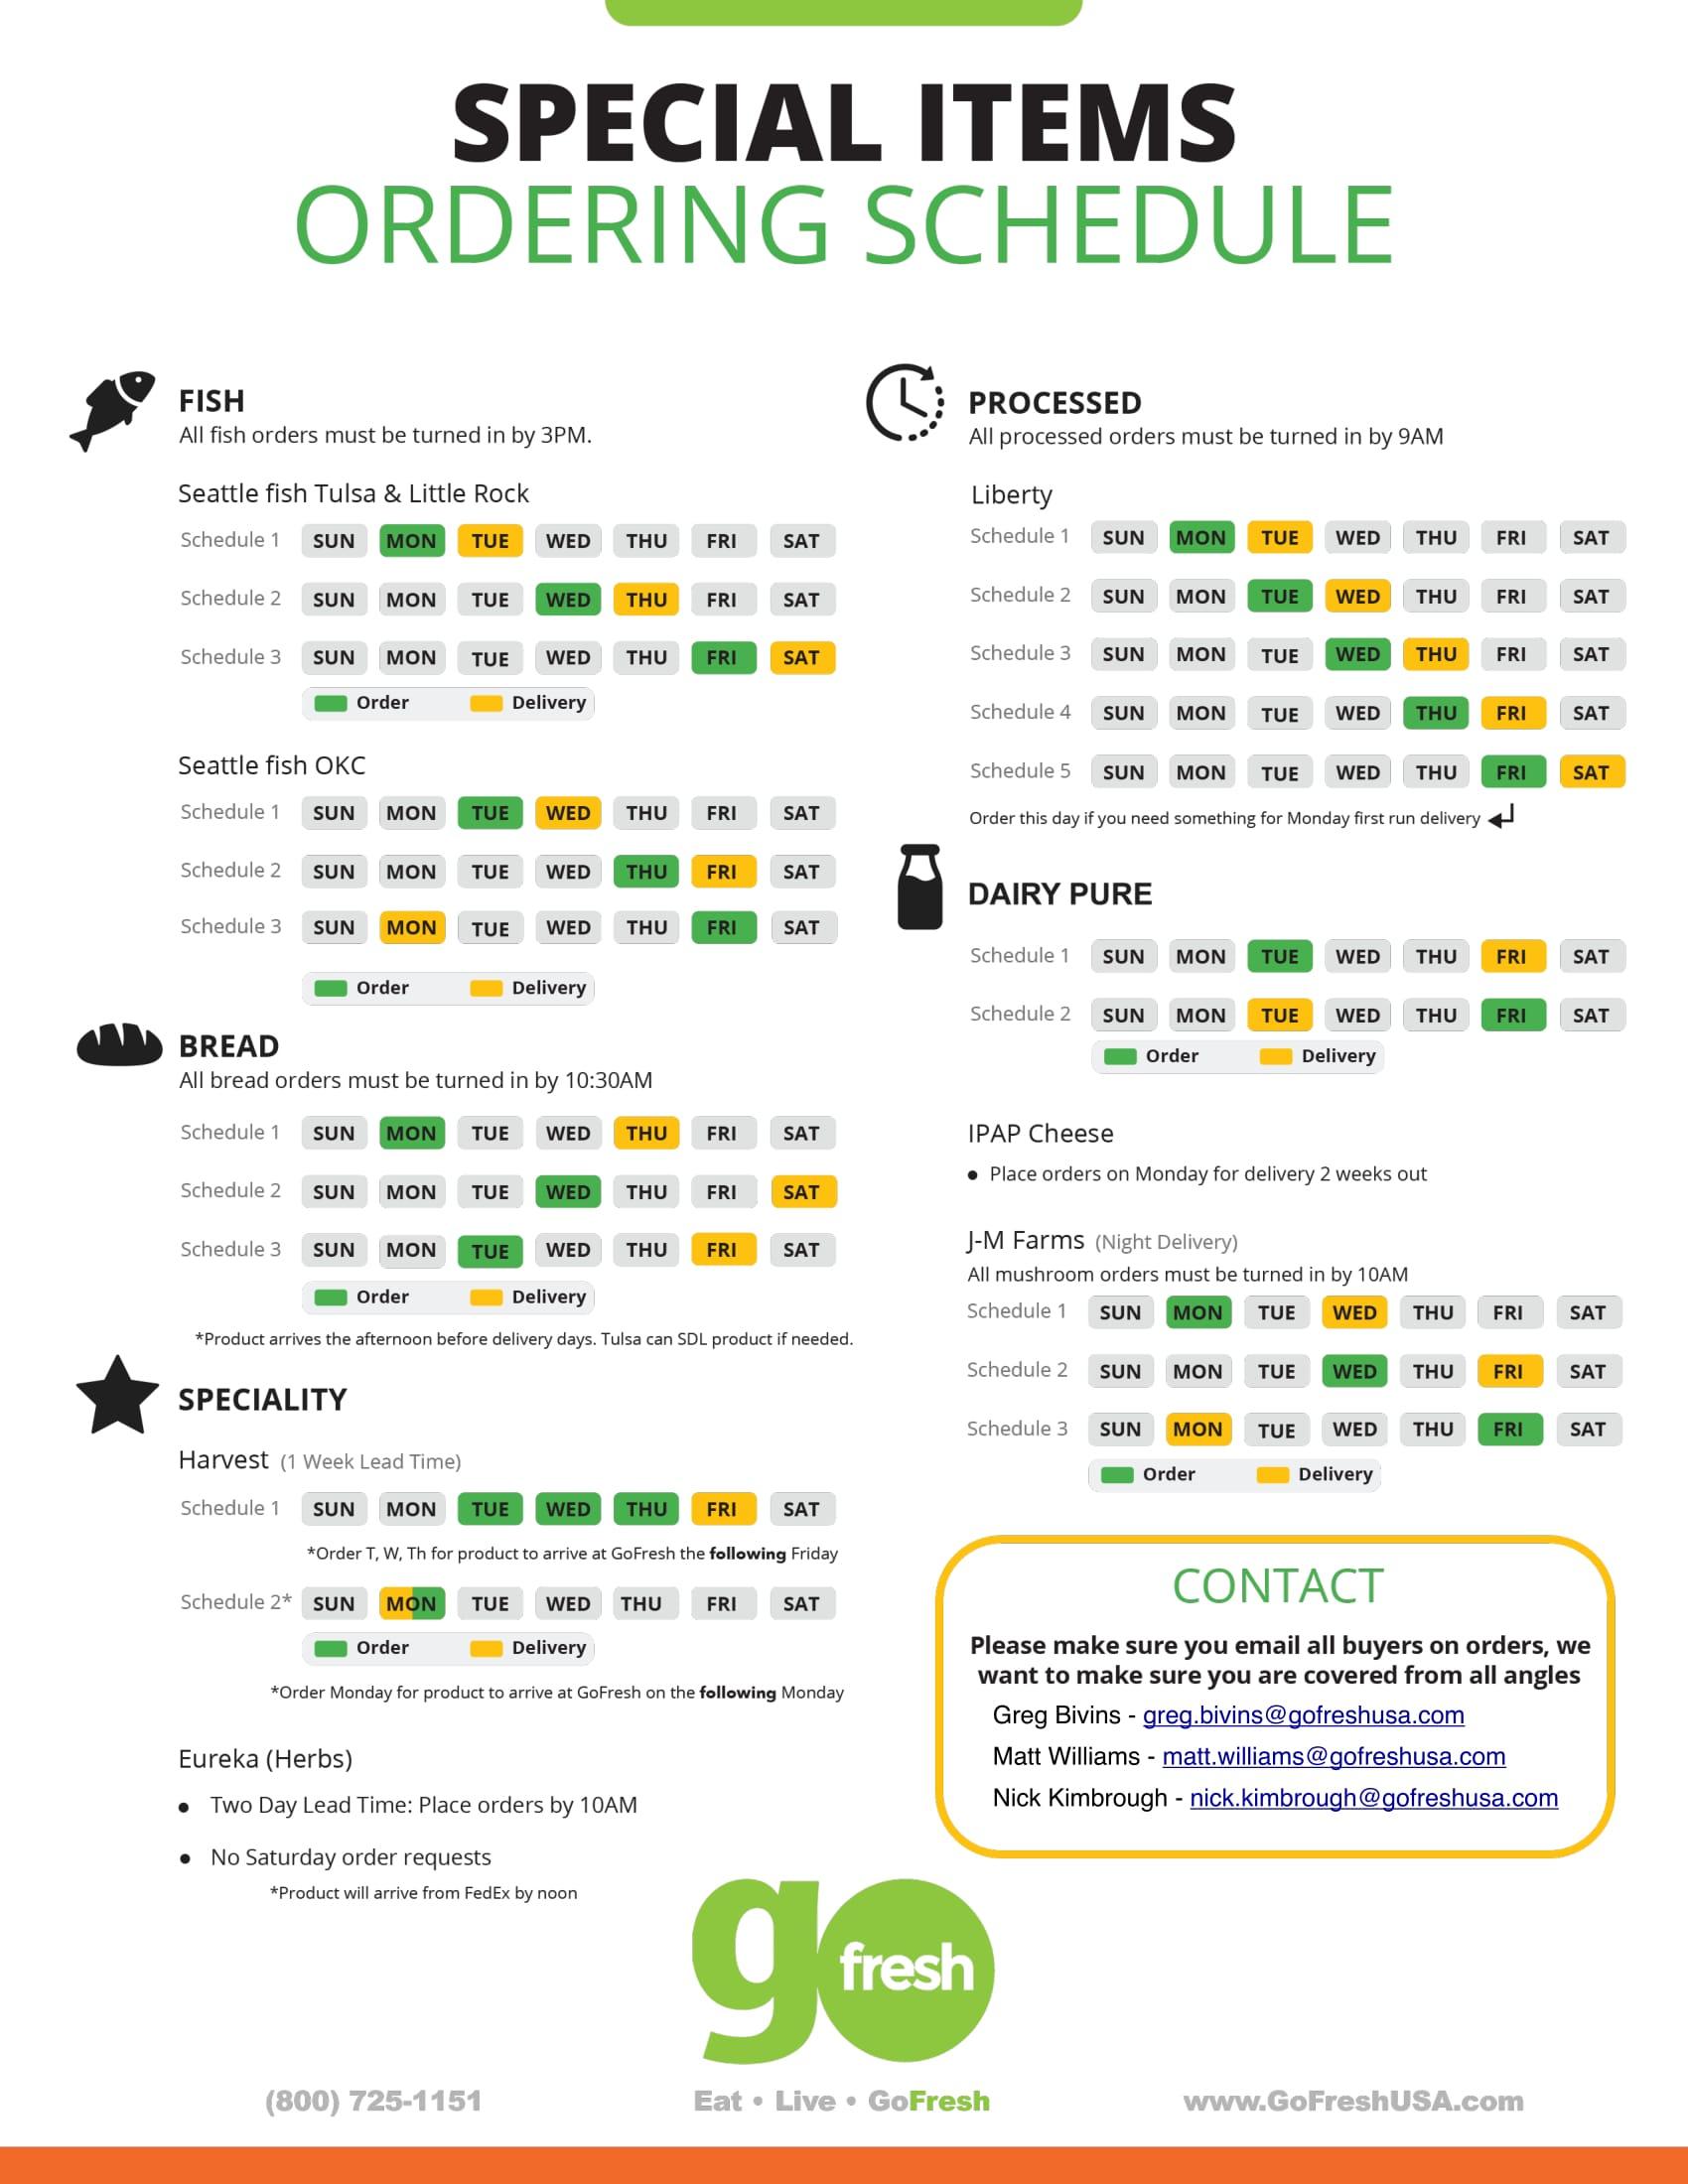 GoFresh Ordering Schedule